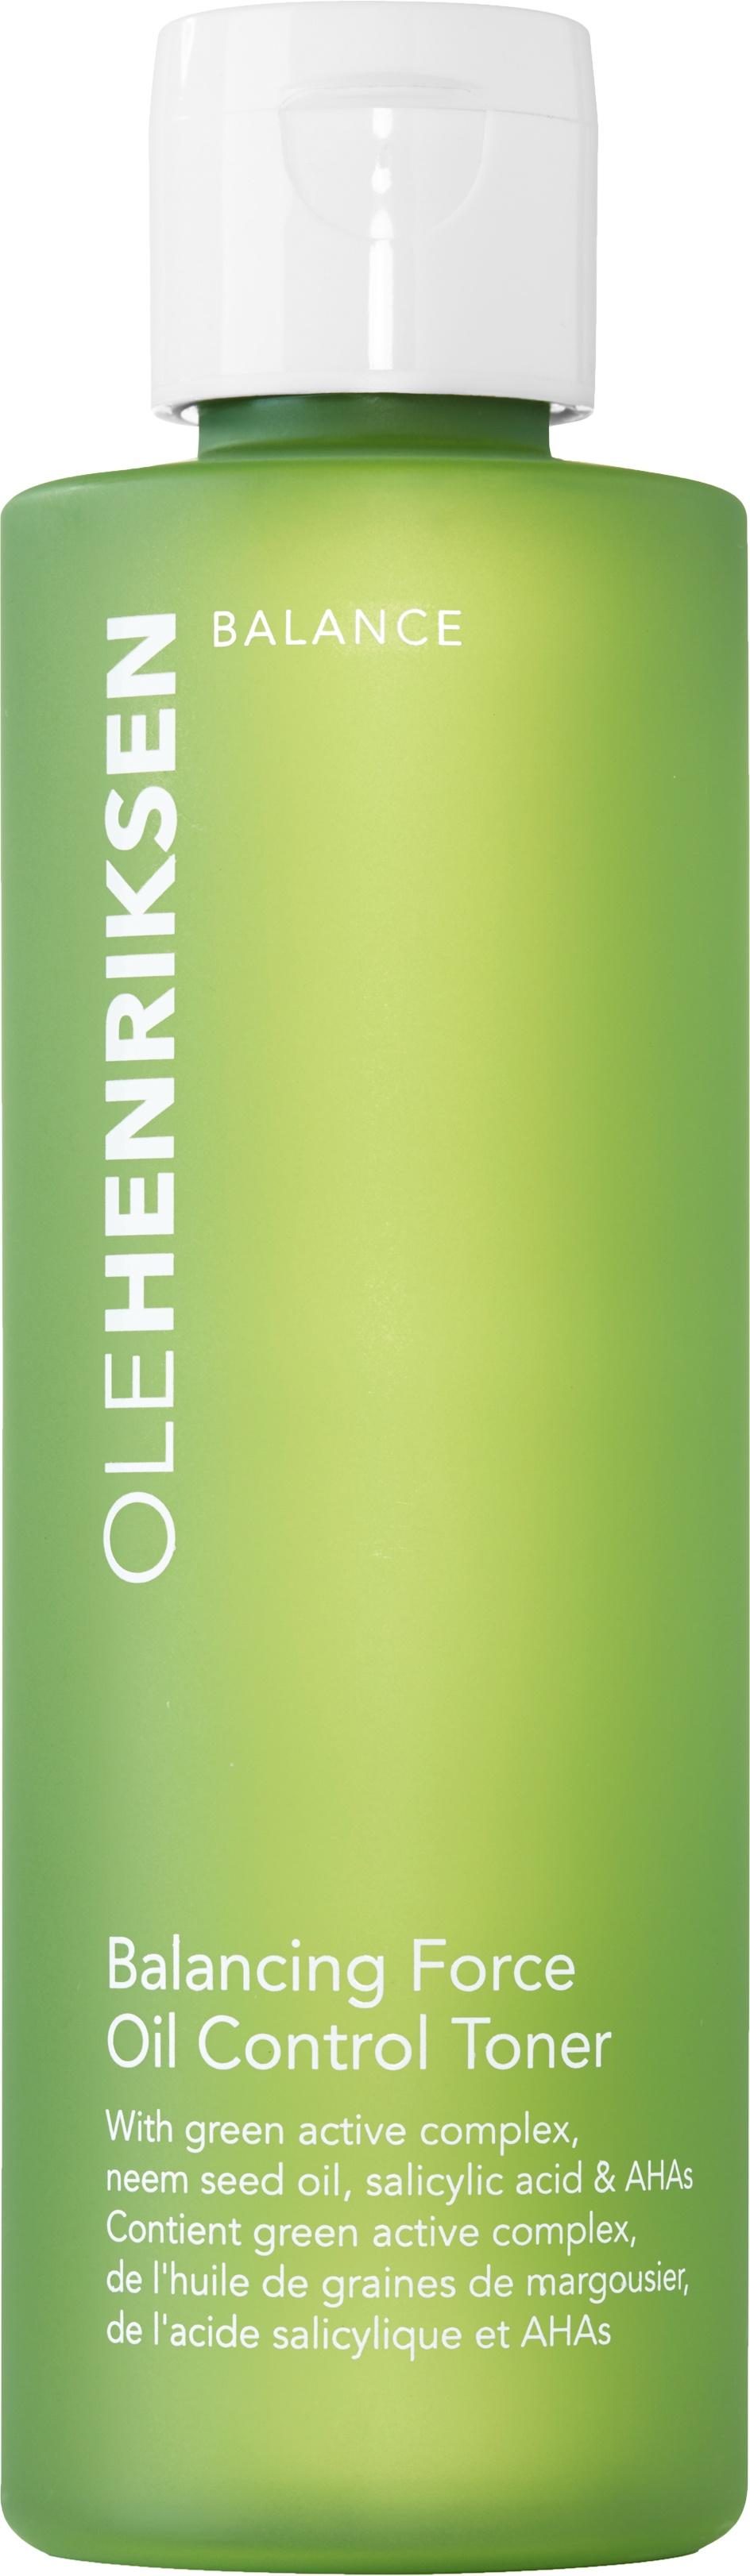 Ole Henriksen Balance Balancing Force Oil Control Toner, 198 ml